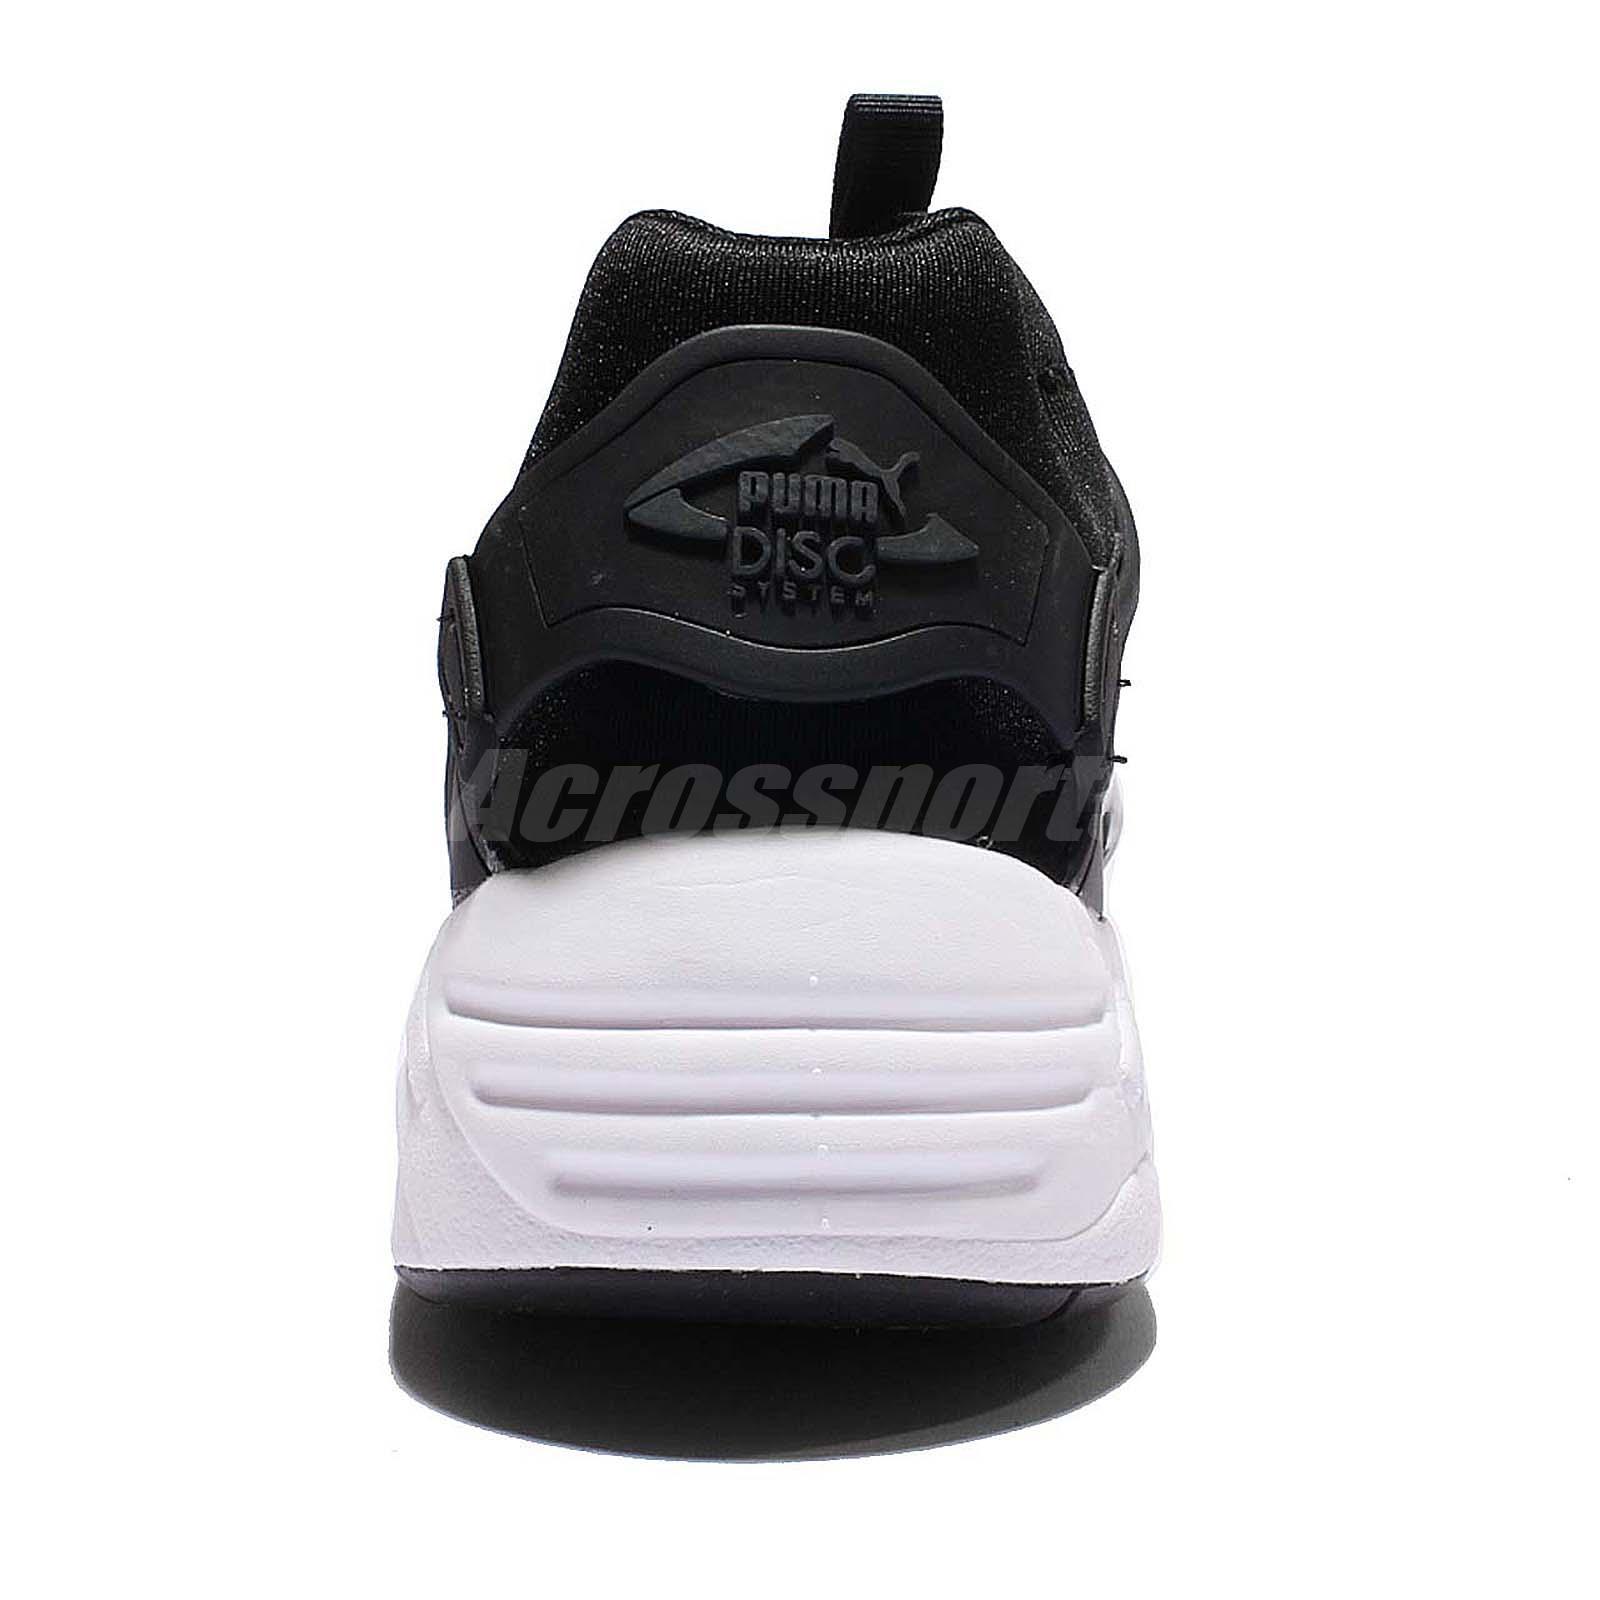 93d475d43 Puma Disc Blaze-actualizado Core Spec Negro Blanco Zapatos ...